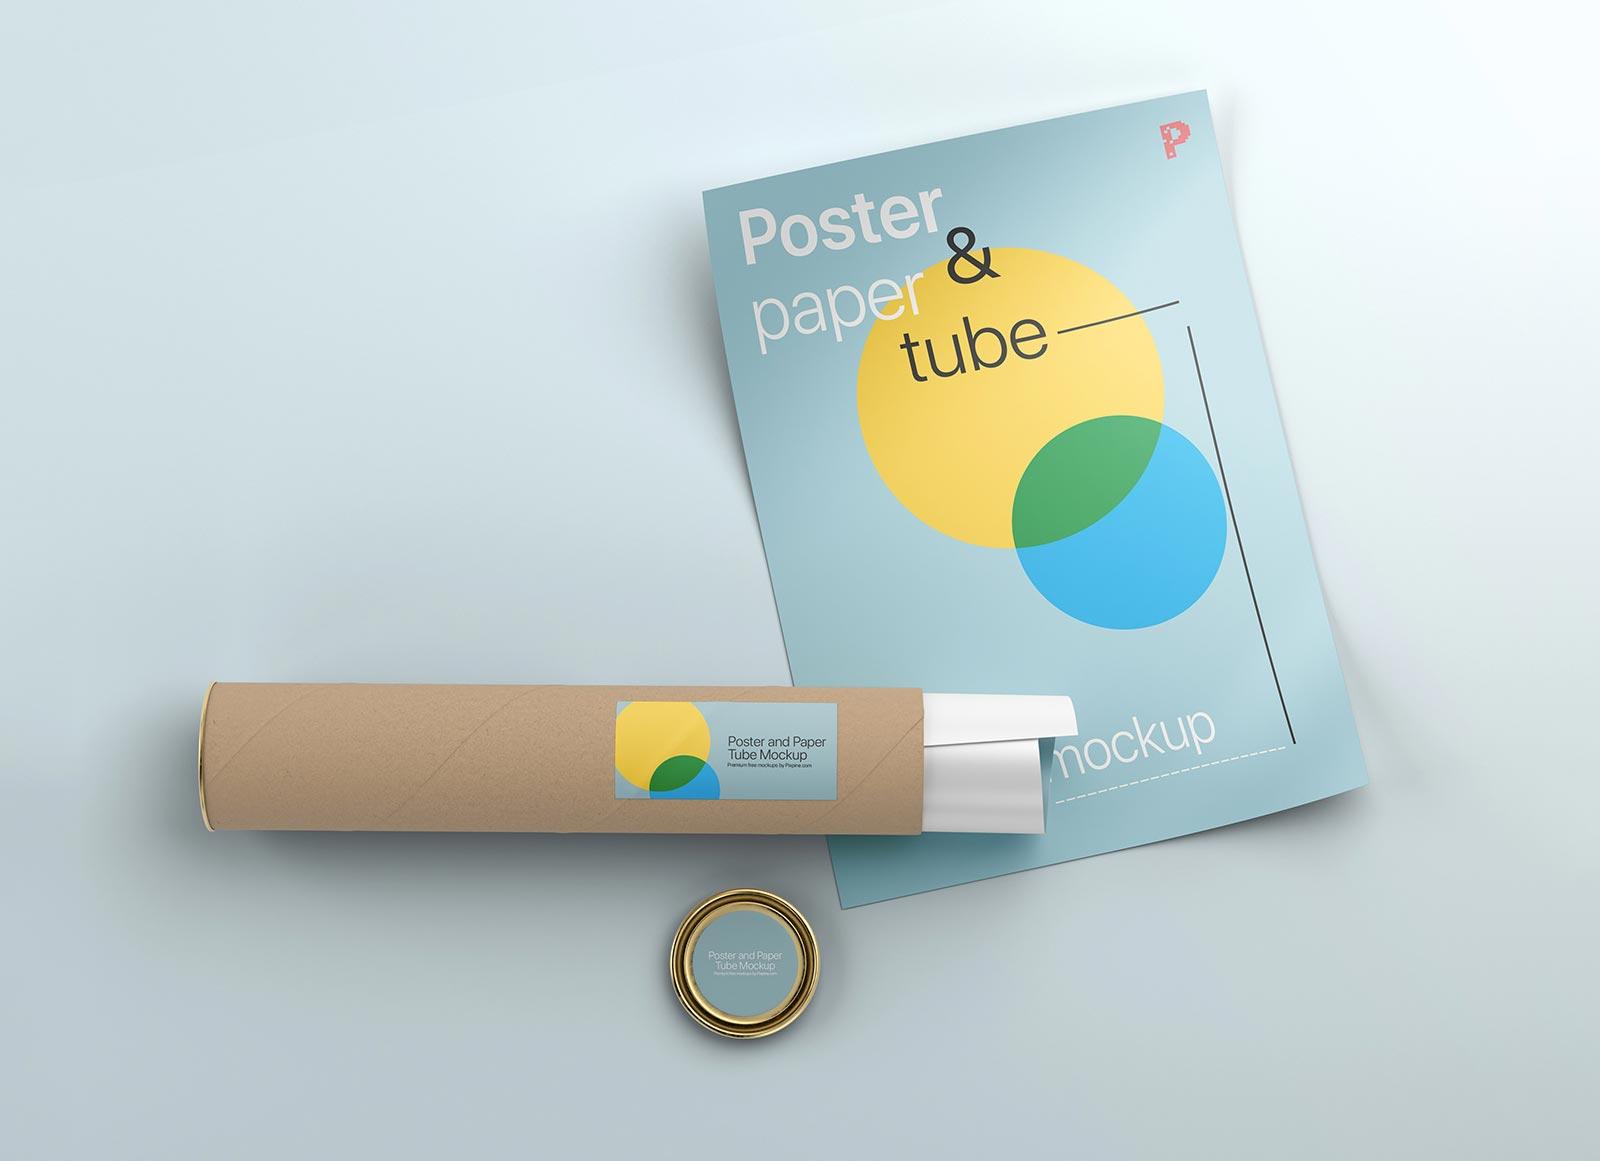 Free-Poster-&-Paper-Tube-Mockup-PSD